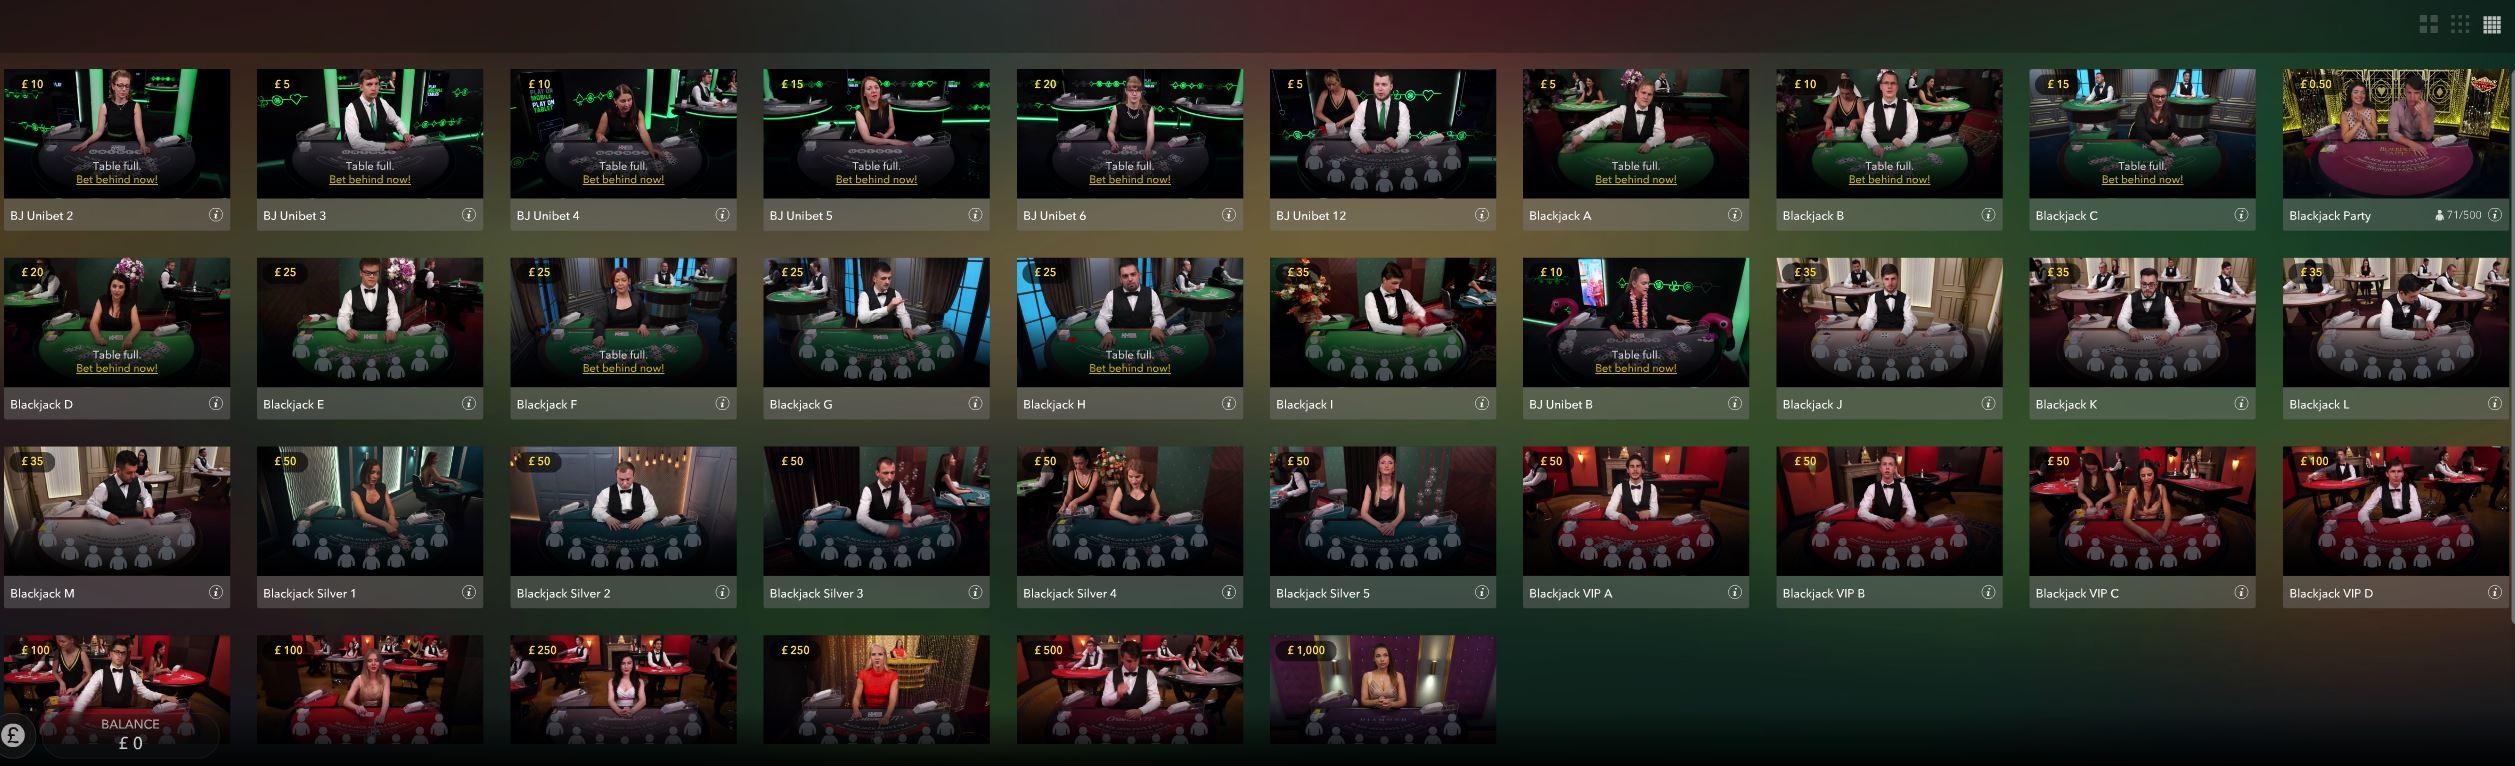 Stan James Live Casino Blackjack